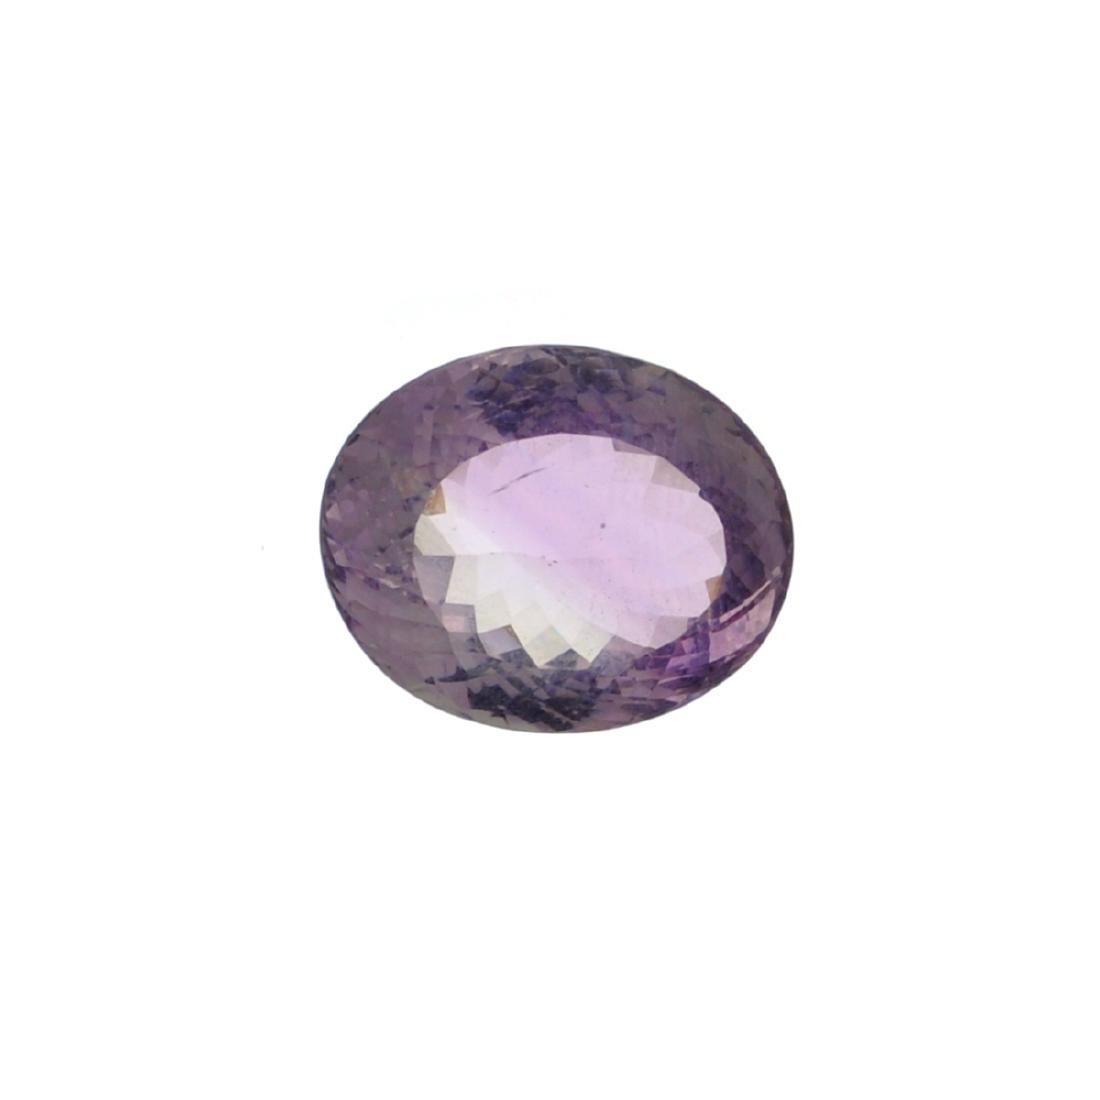 APP: 2.5k 28.50CT Oval Cut Light Purple Amethyst Quartz